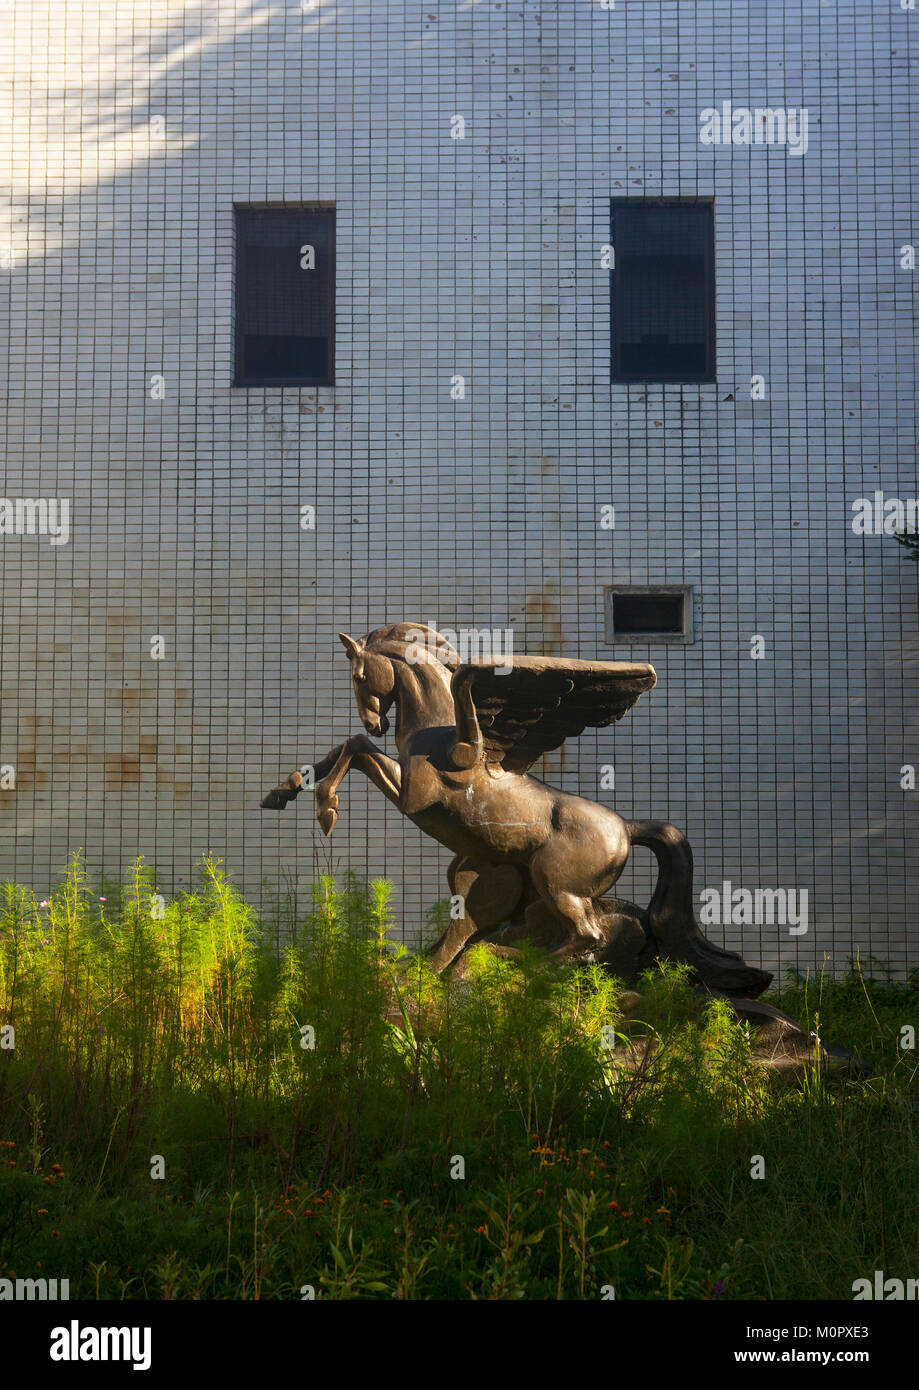 Chollima horse statue in Songdowon international children's camp, Kangwon Province, Wonsan, North Korea - Stock Image